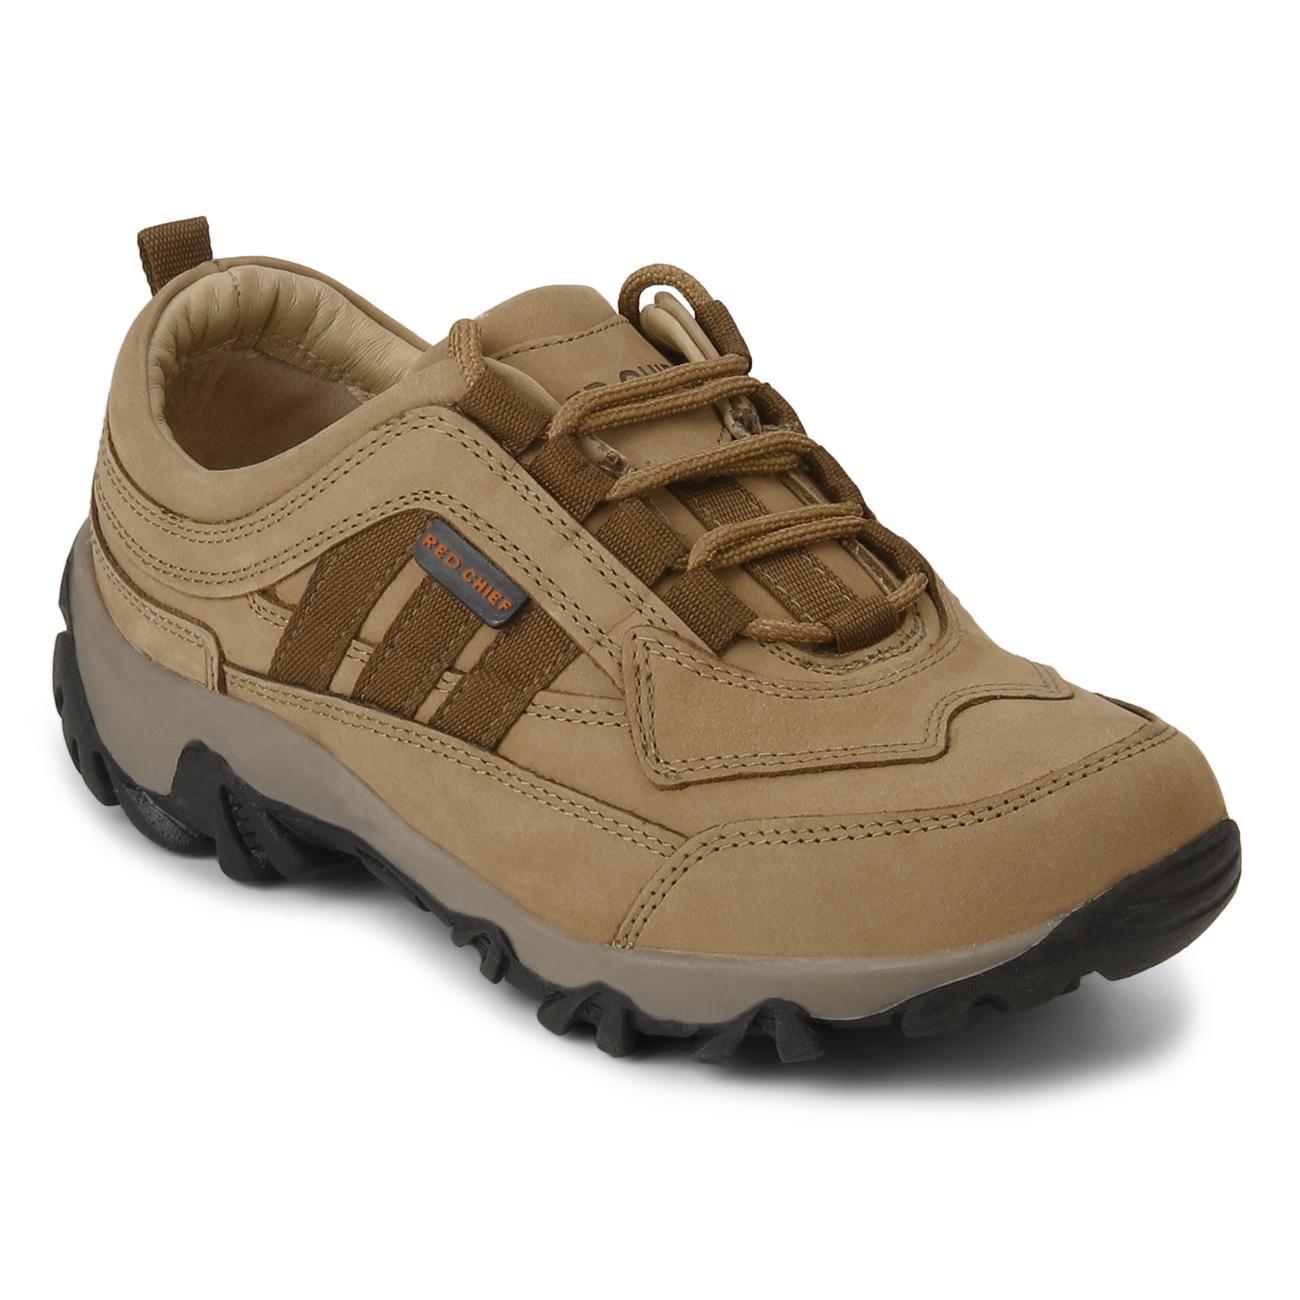 camel shoes trademark symbol 693879